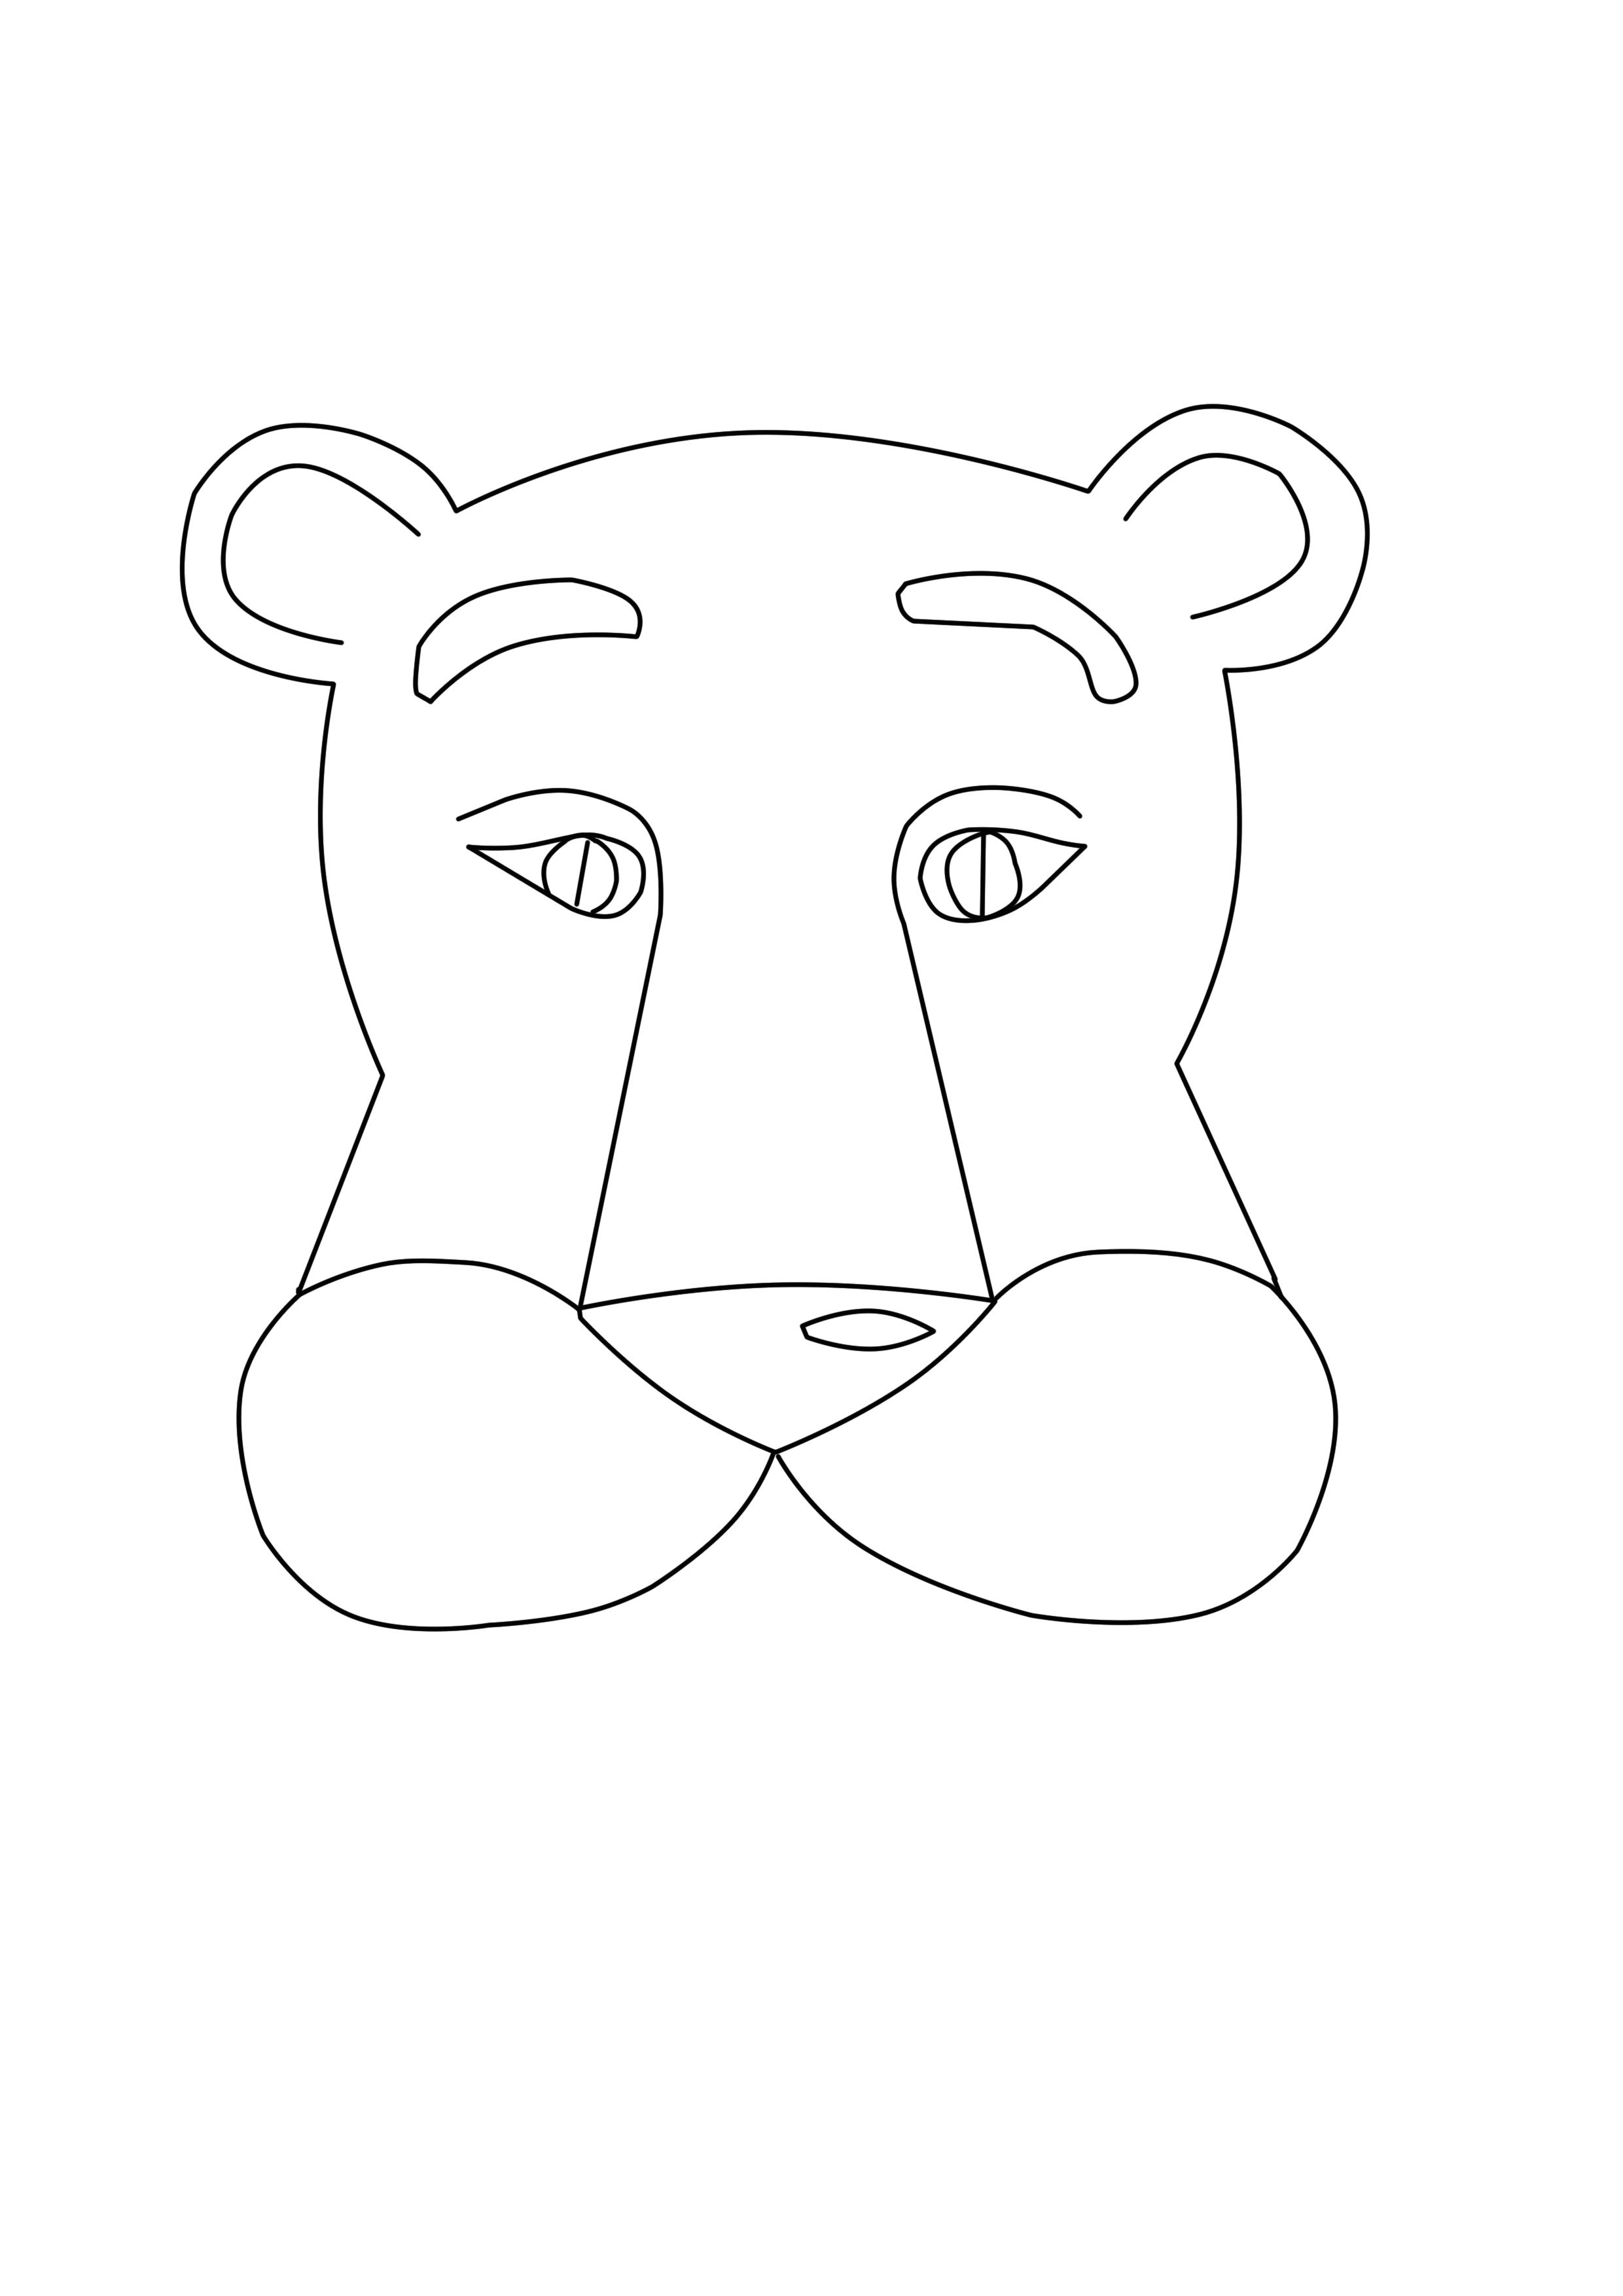 Лев (шаблон для распечатывания)